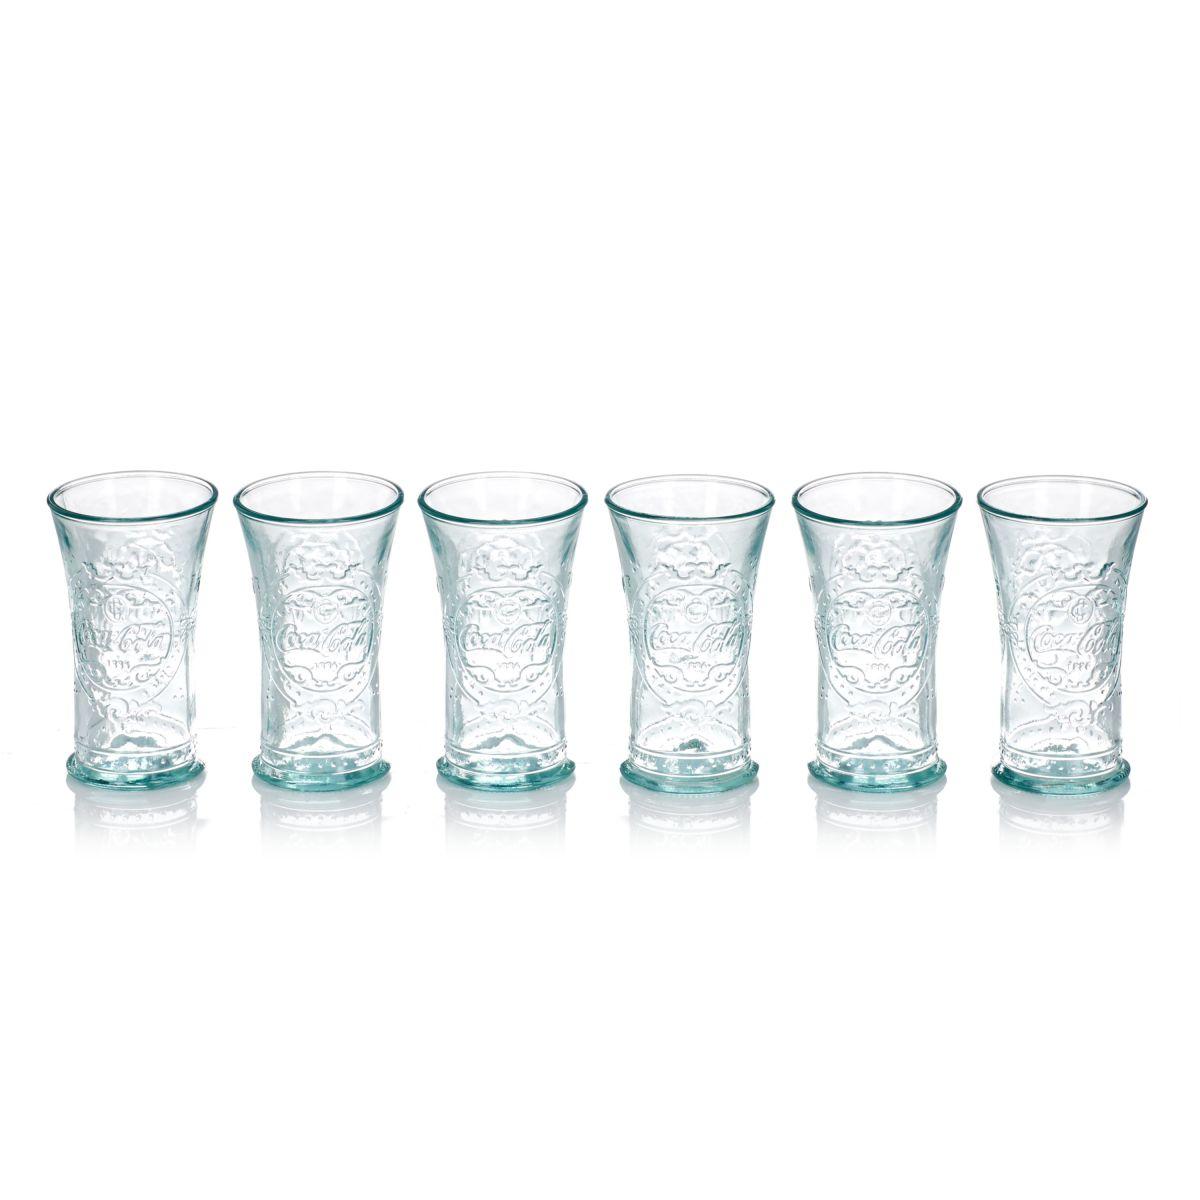 Glas-Set, 6-tlg., gemustert, Recyclingglas (Impressionen)